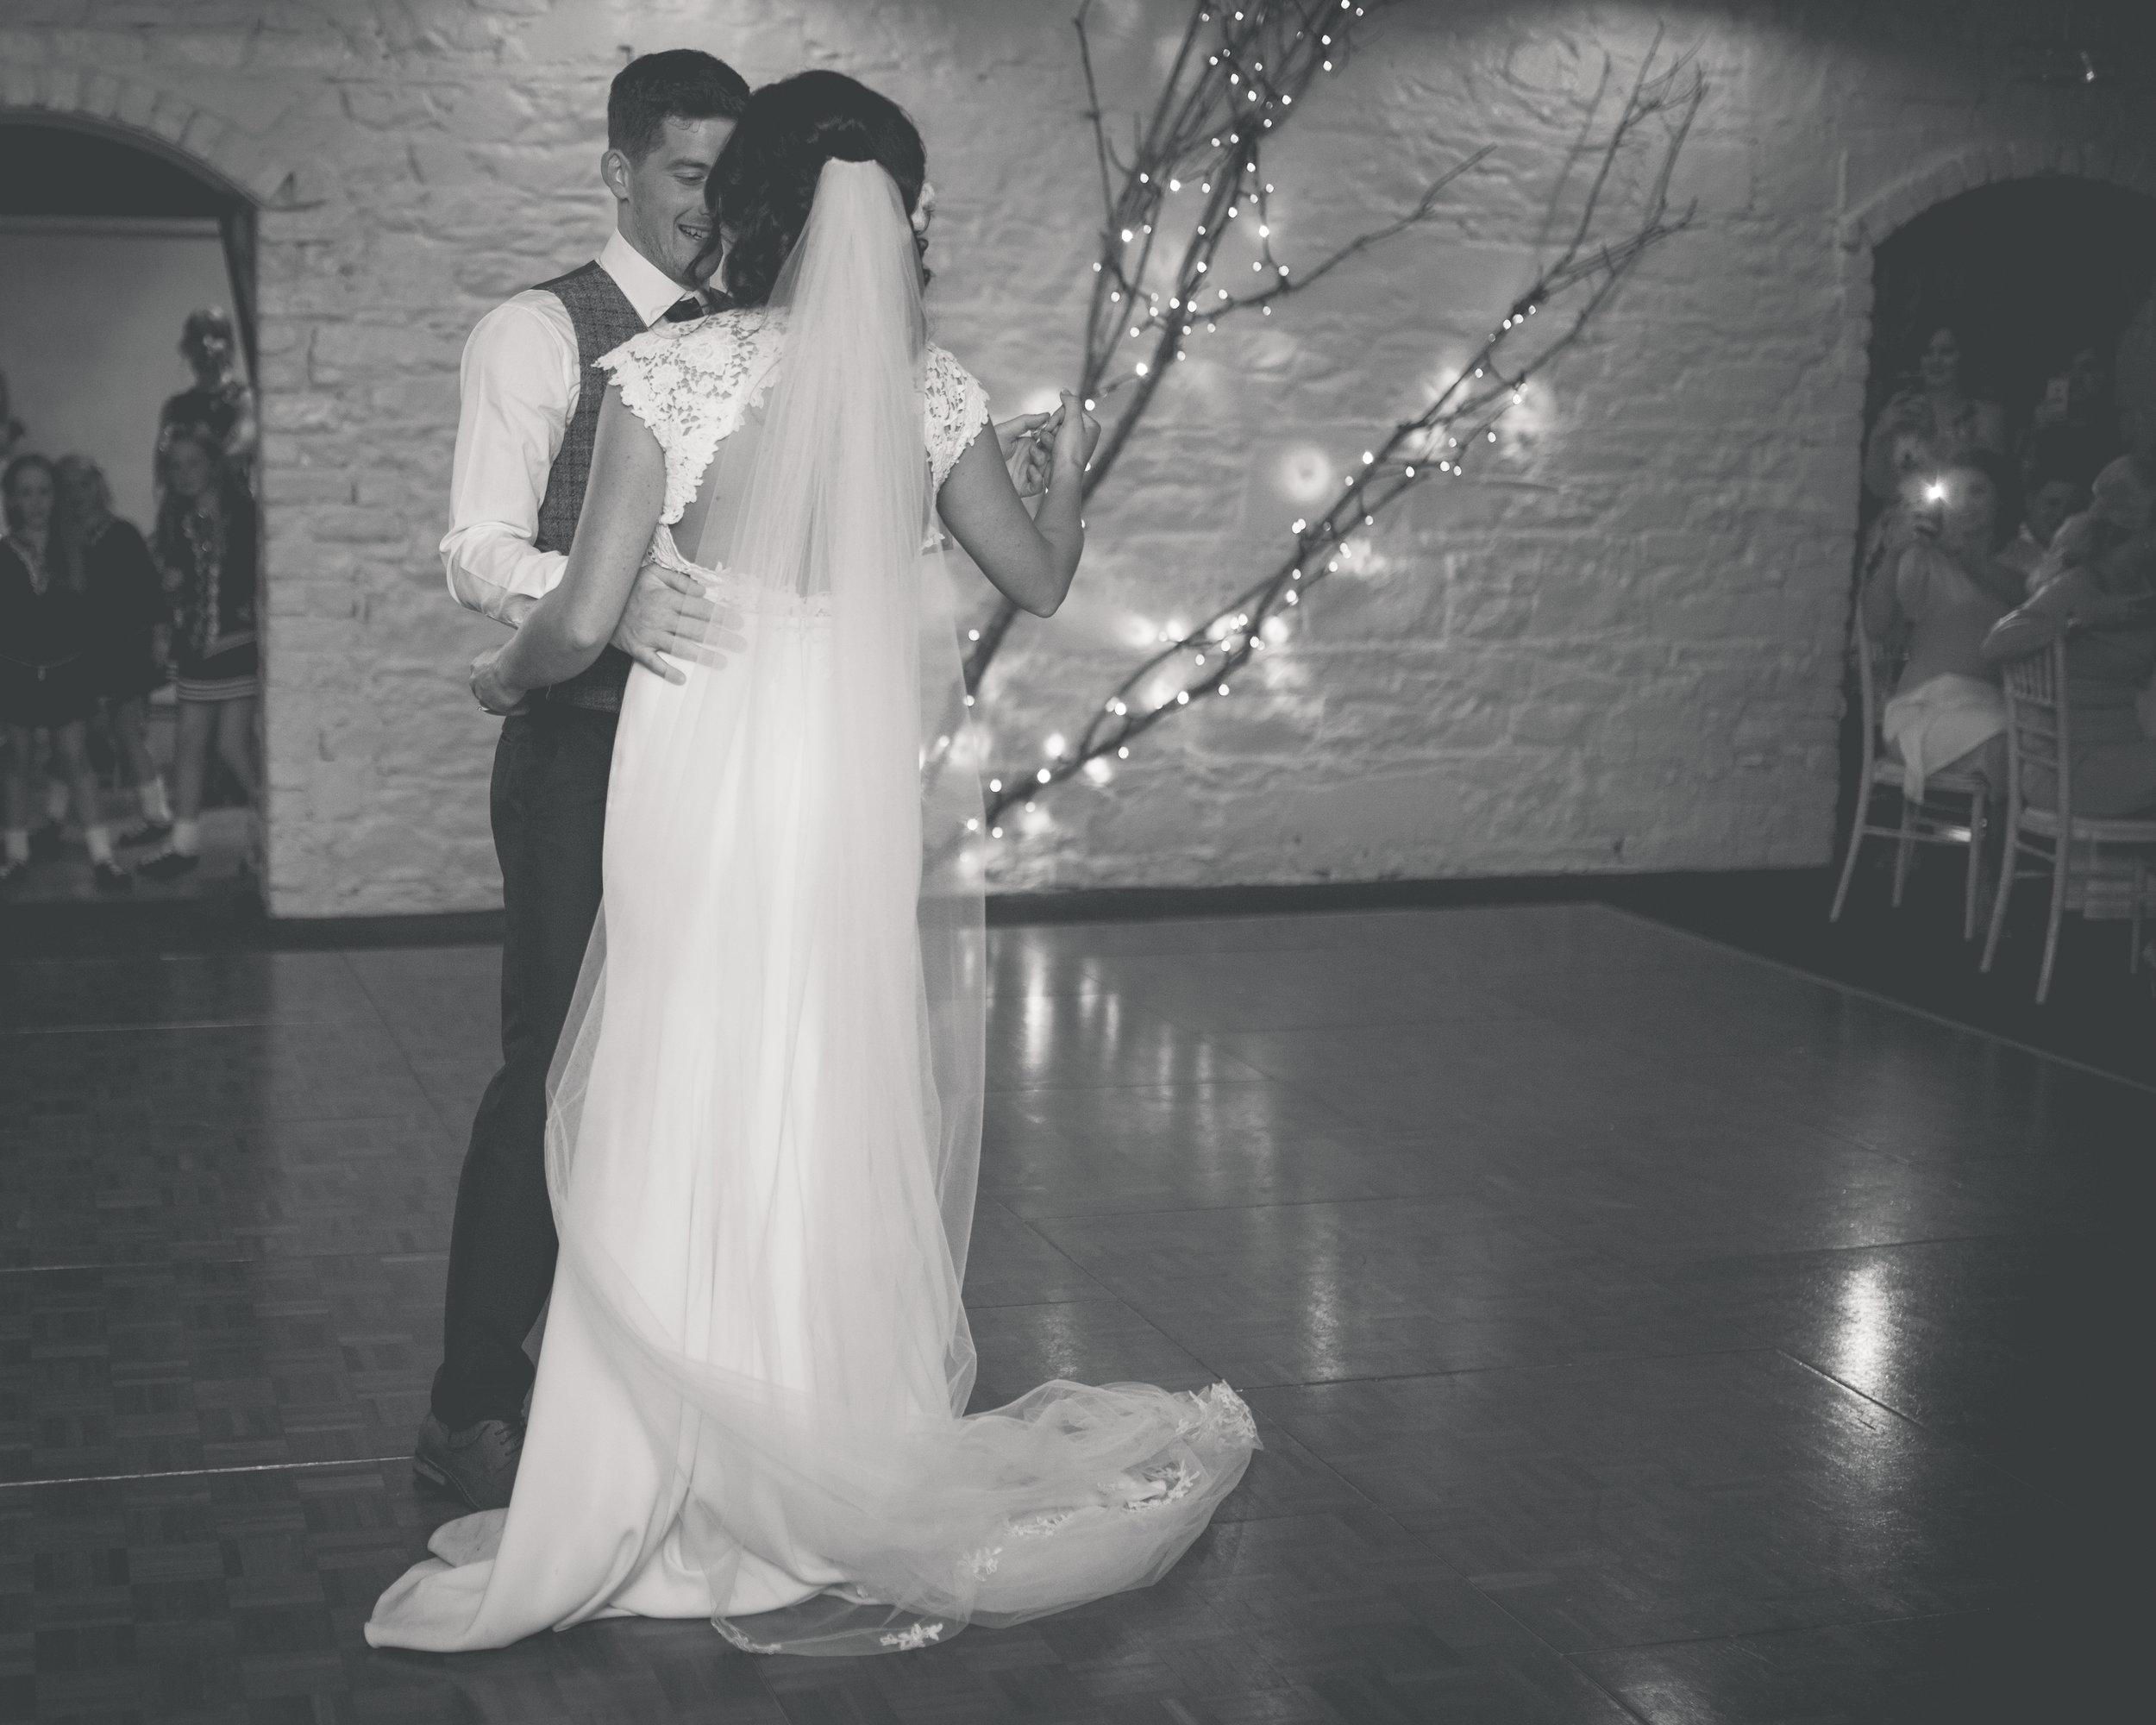 Brian McEwan Wedding Photography | Carol-Annee & Sean | The Dancing-22.jpg